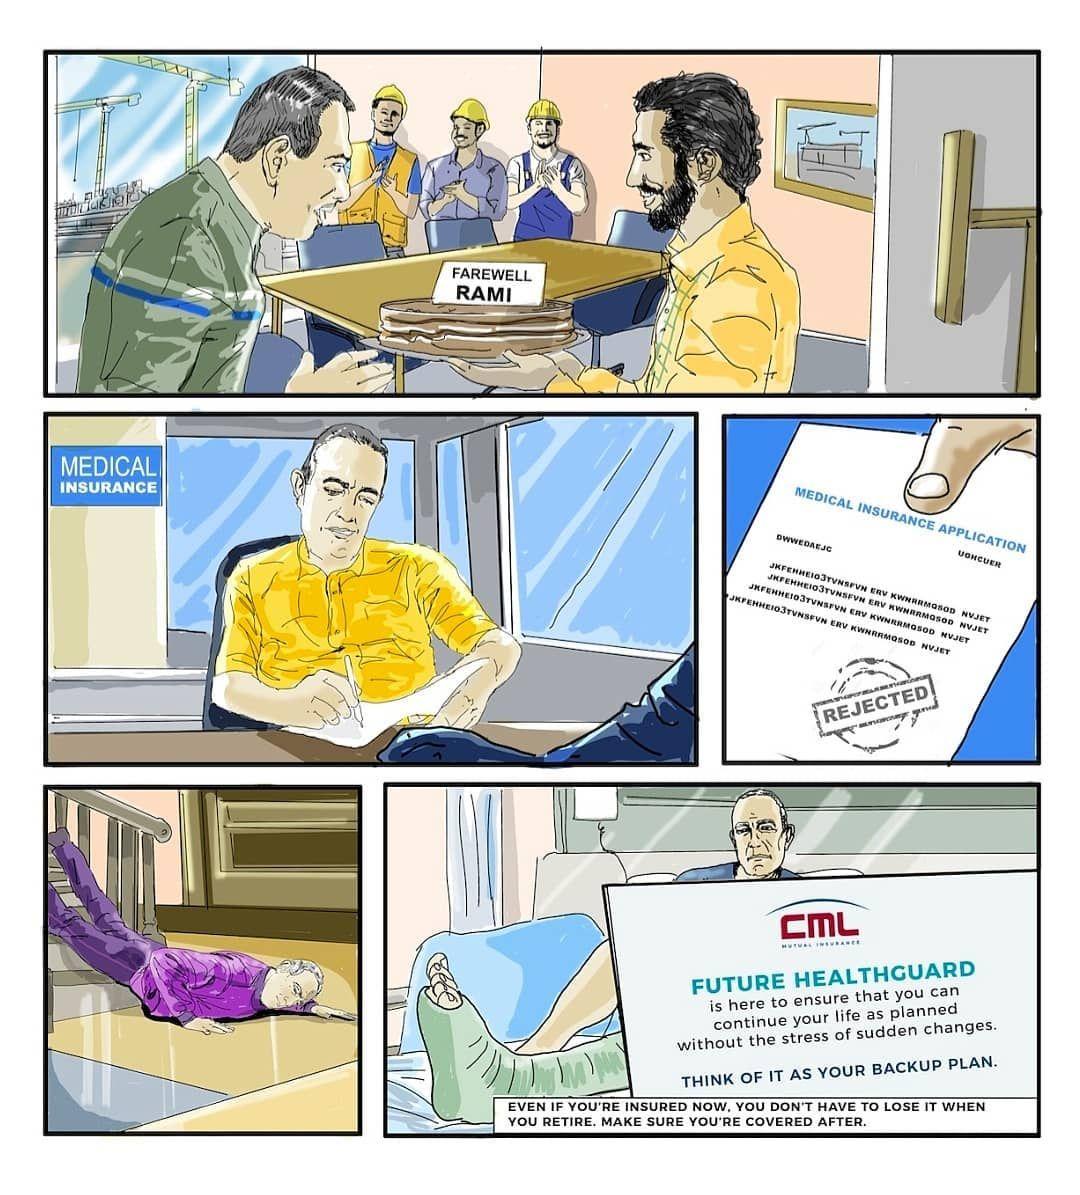 Be Careful Insurancecompany Insurancepolicy Insurancehealth